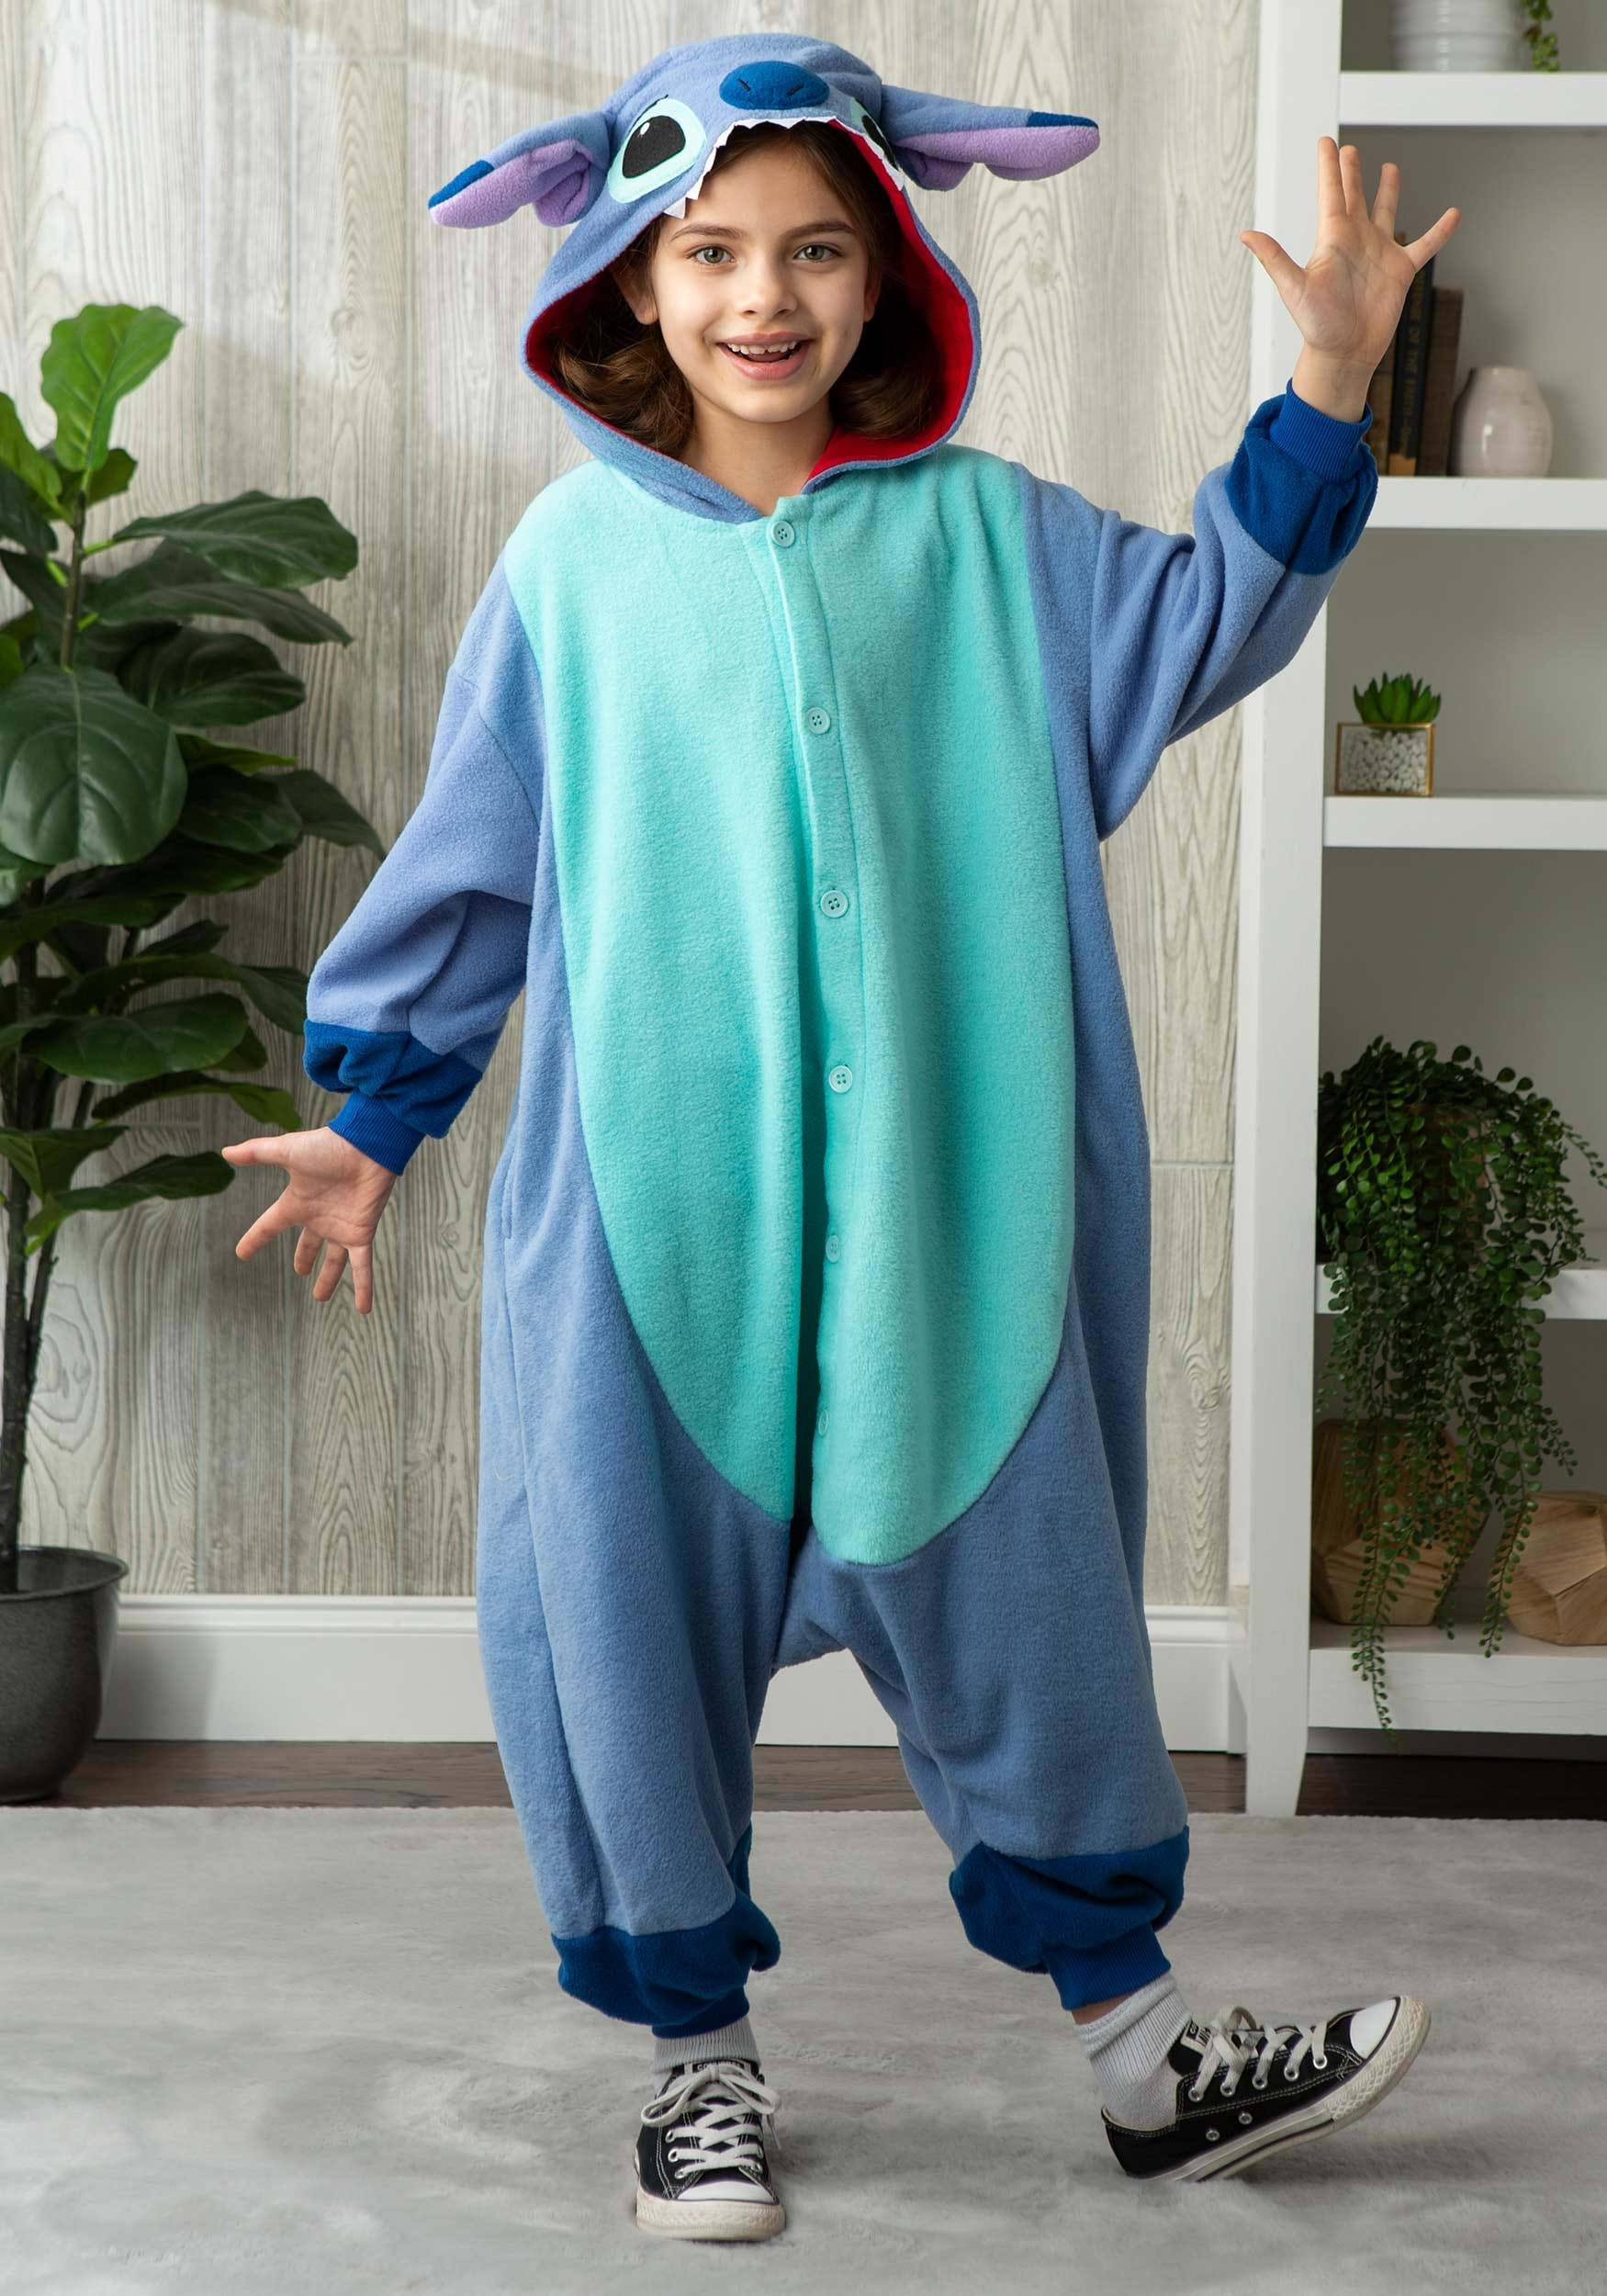 abee1dece20 Disney Lilo and Stitch Kids Stitch Kigurumi